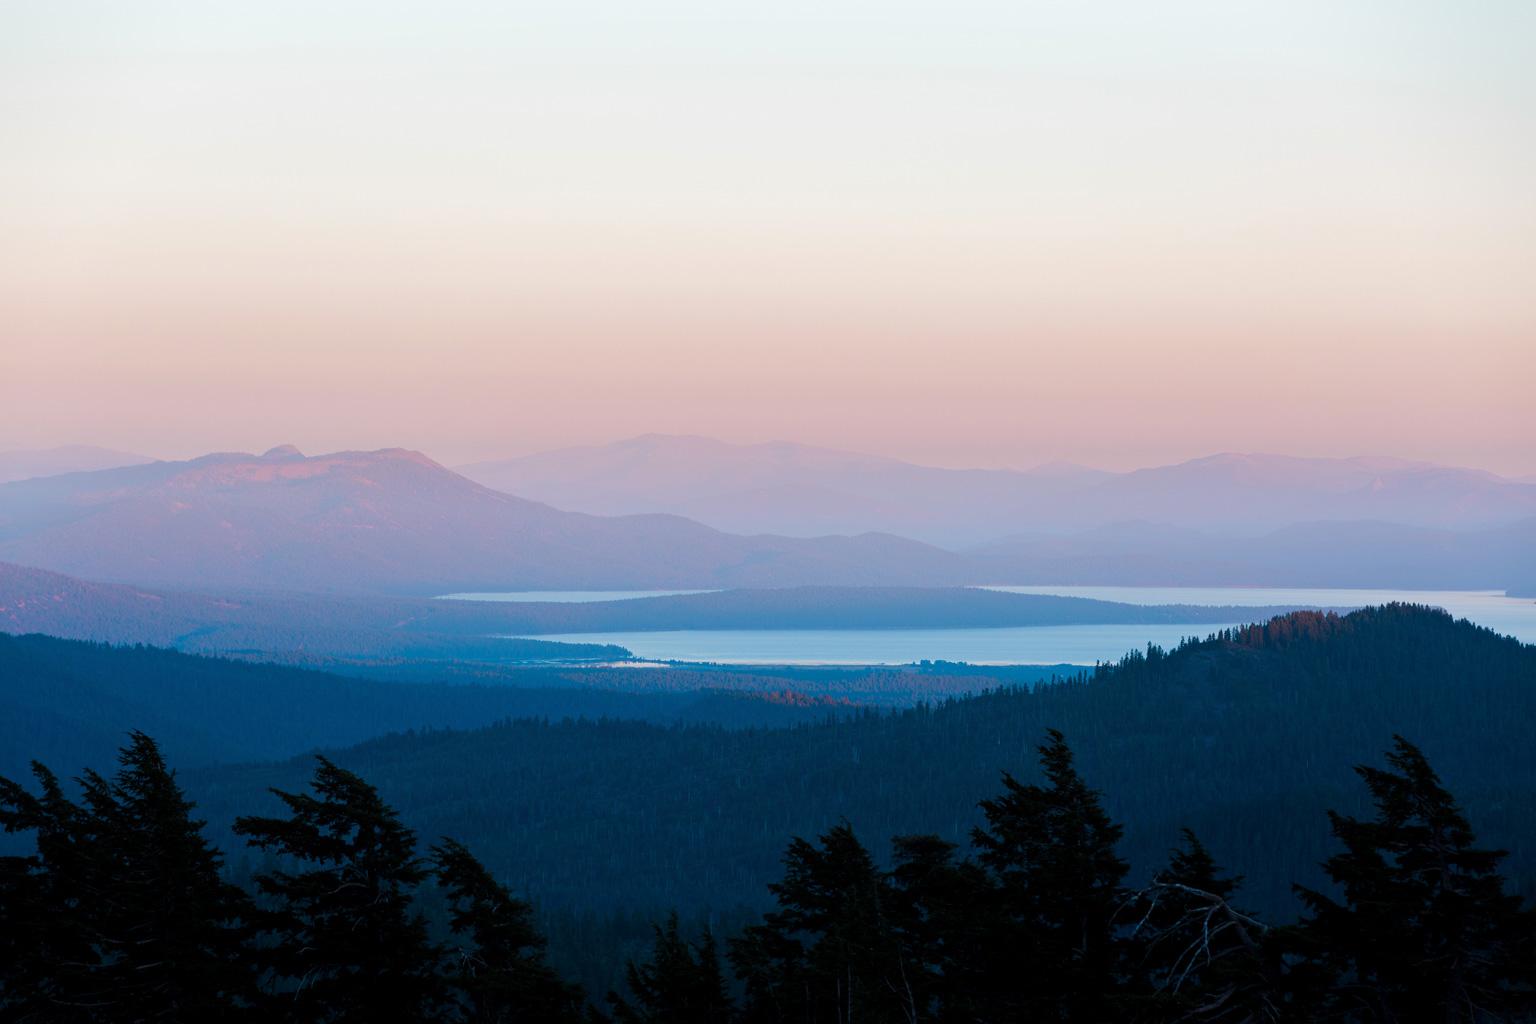 CindyGiovagnoli_Lassen_Volcanic_National_Park_California_camp_road_trip-025.jpg